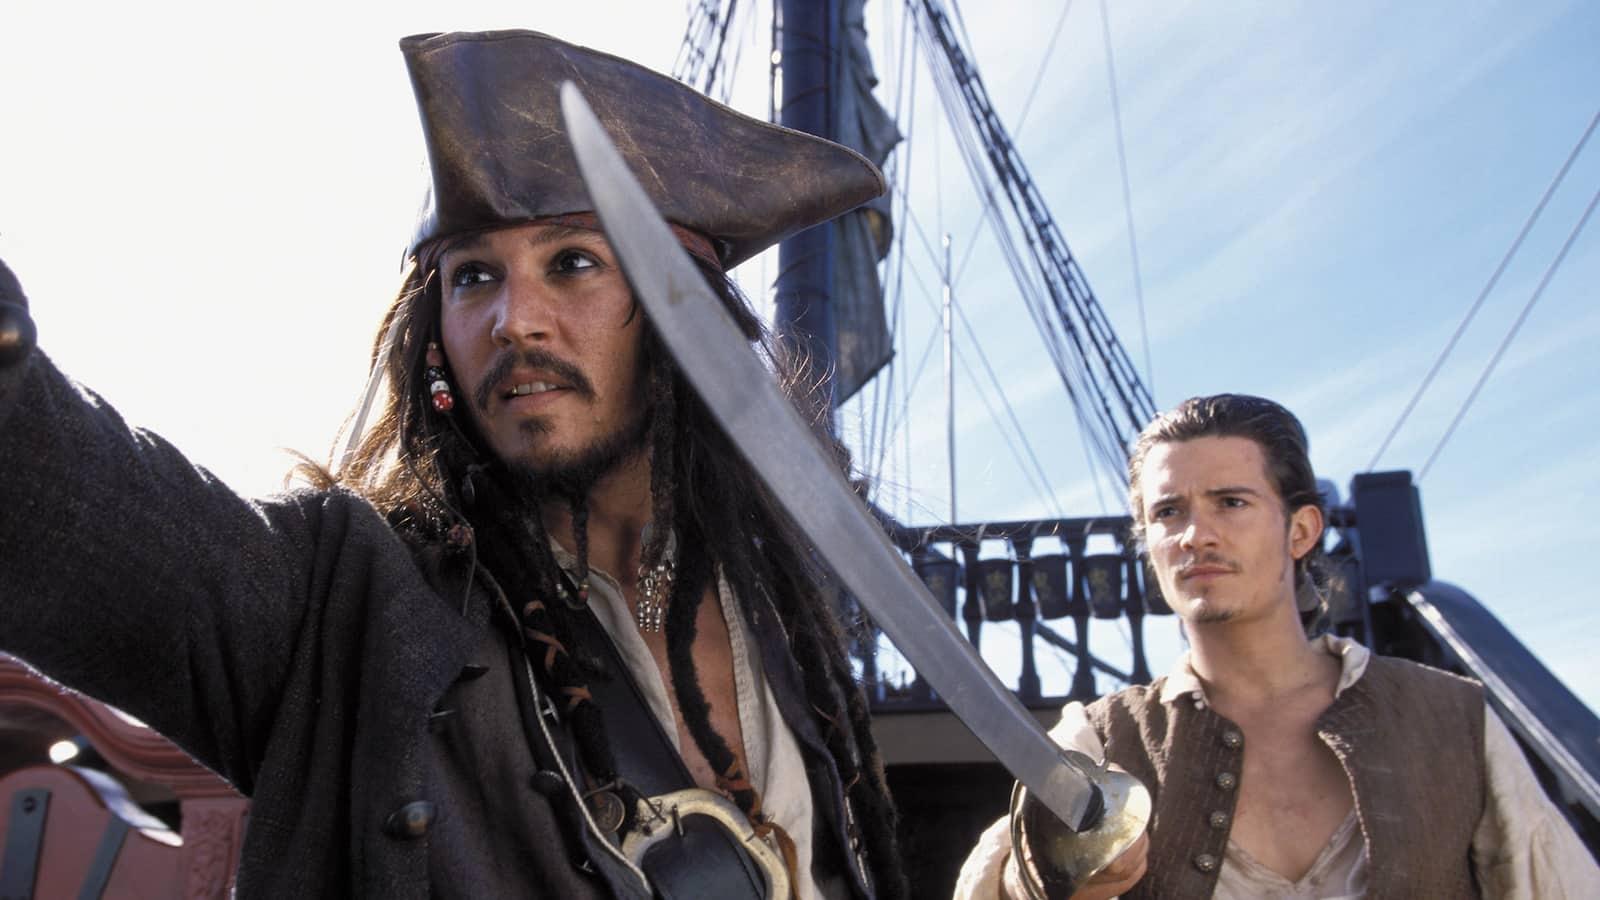 pirates-of-the-caribbean-svarta-parlans-forbannelse-kop-2003